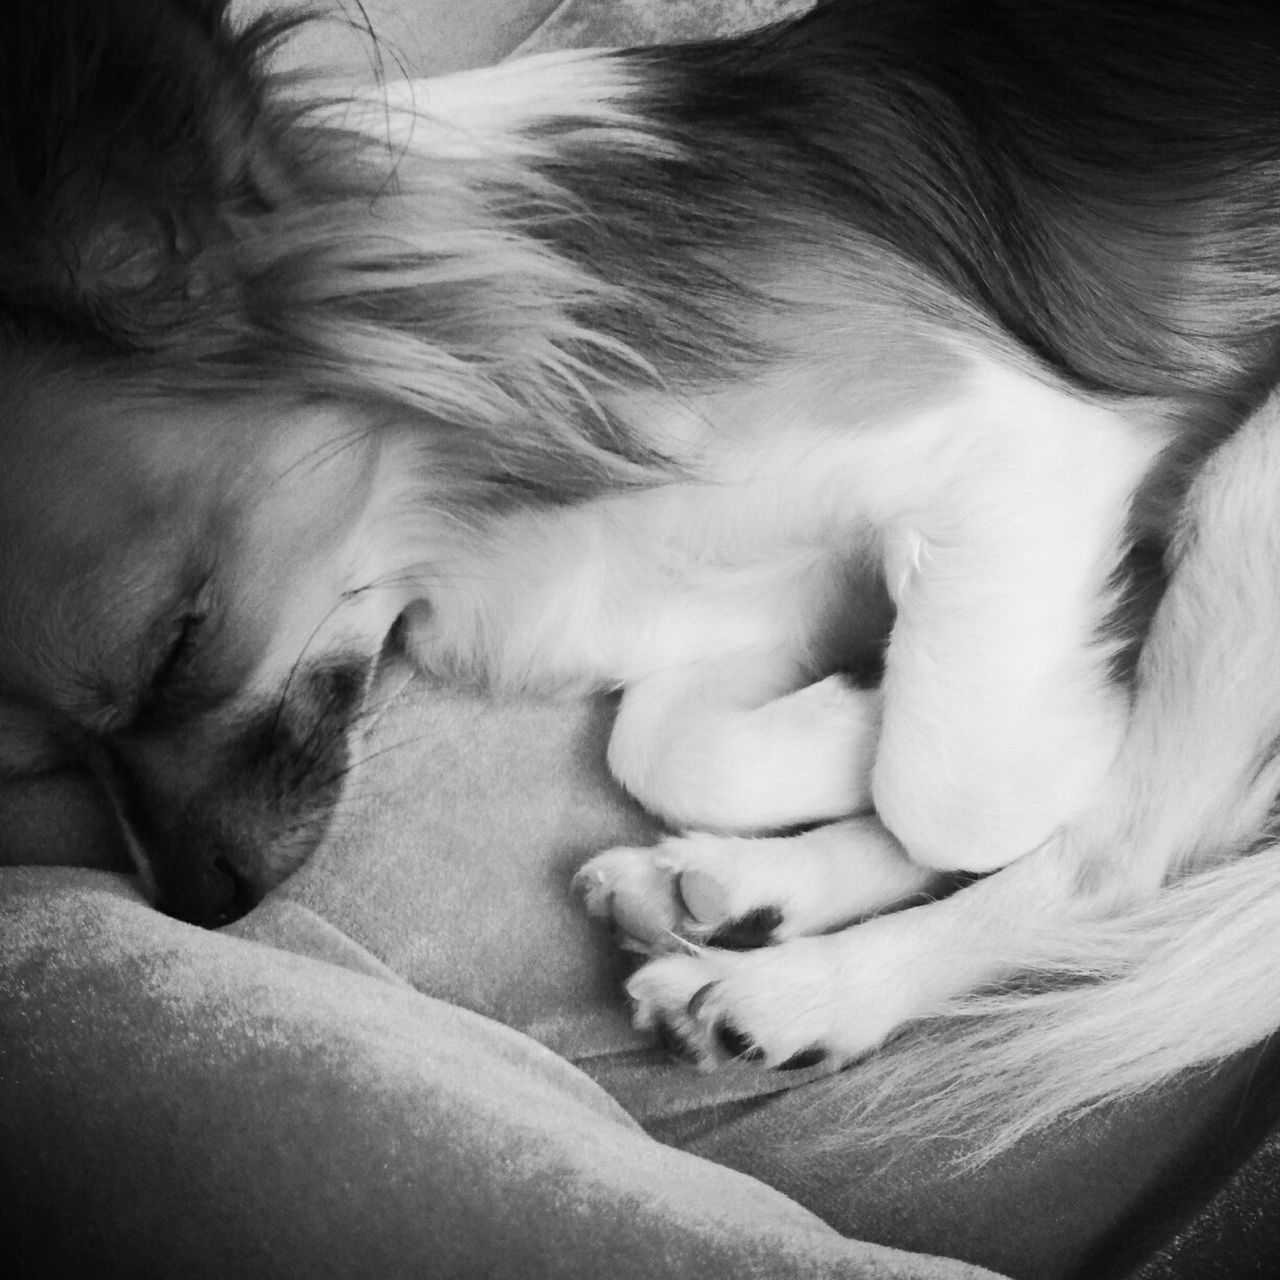 Dog Sleeping On Textile